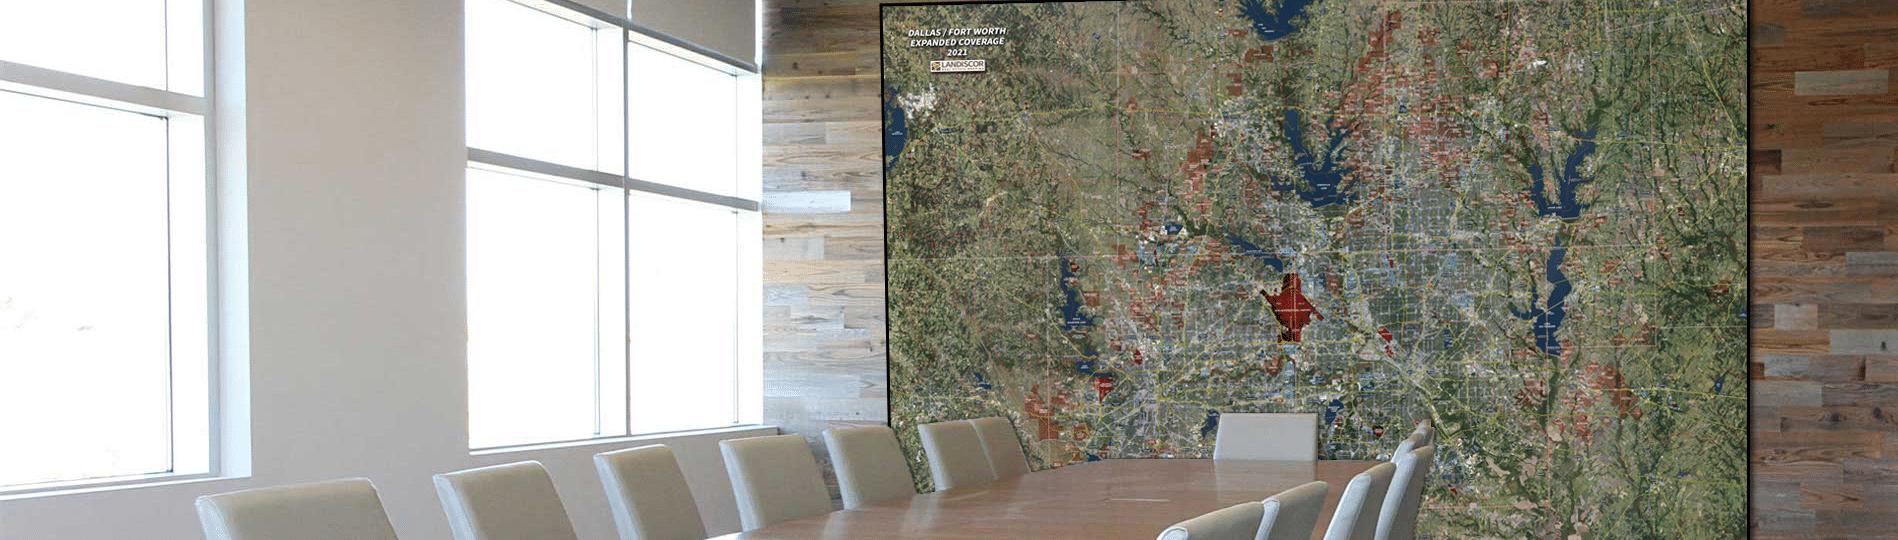 2021-Dallas-Fort-Worth-Aerial-Wall-Mural